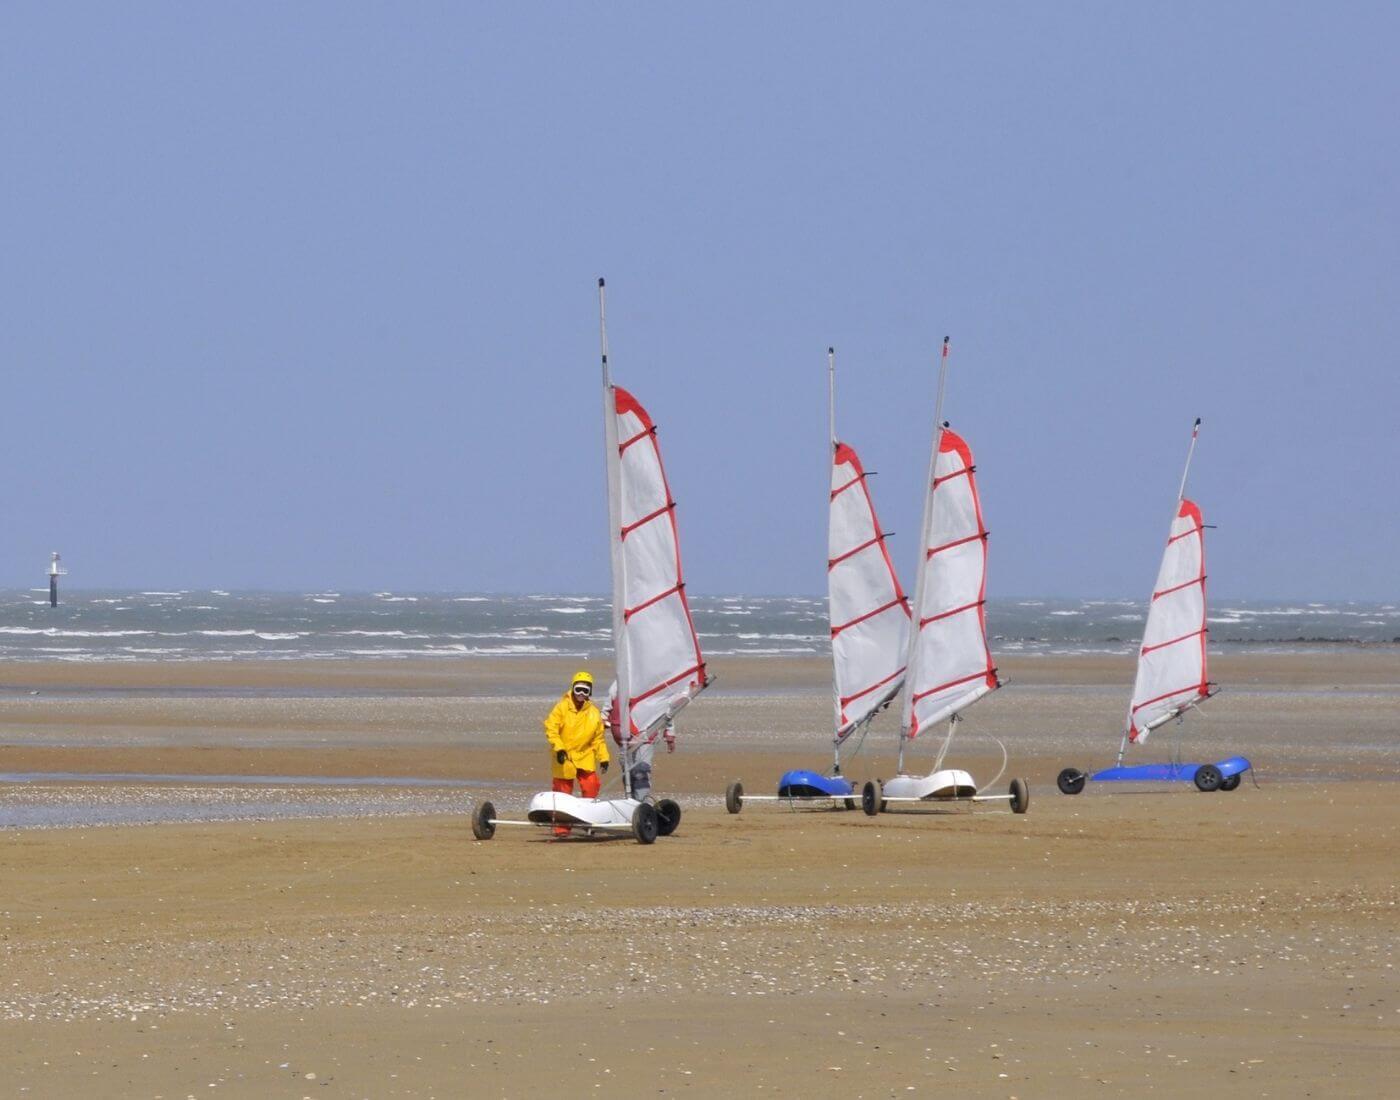 Land Yachting Sports